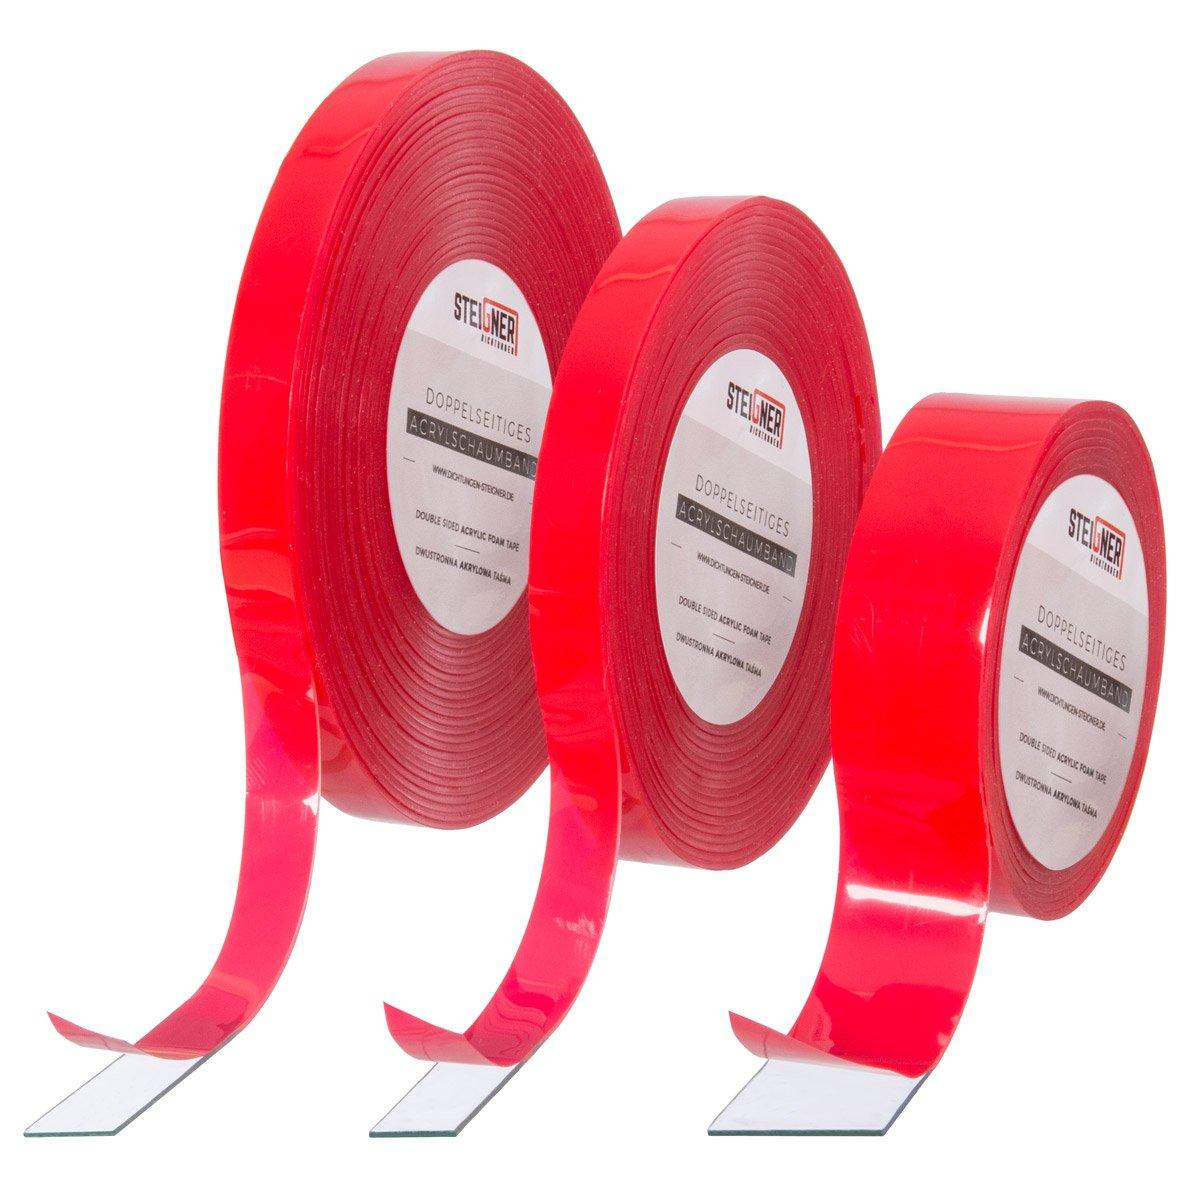 Doppelseitiges Acrylband 1,5m - SK01-T-5 Schaumklebeband Transparent ...